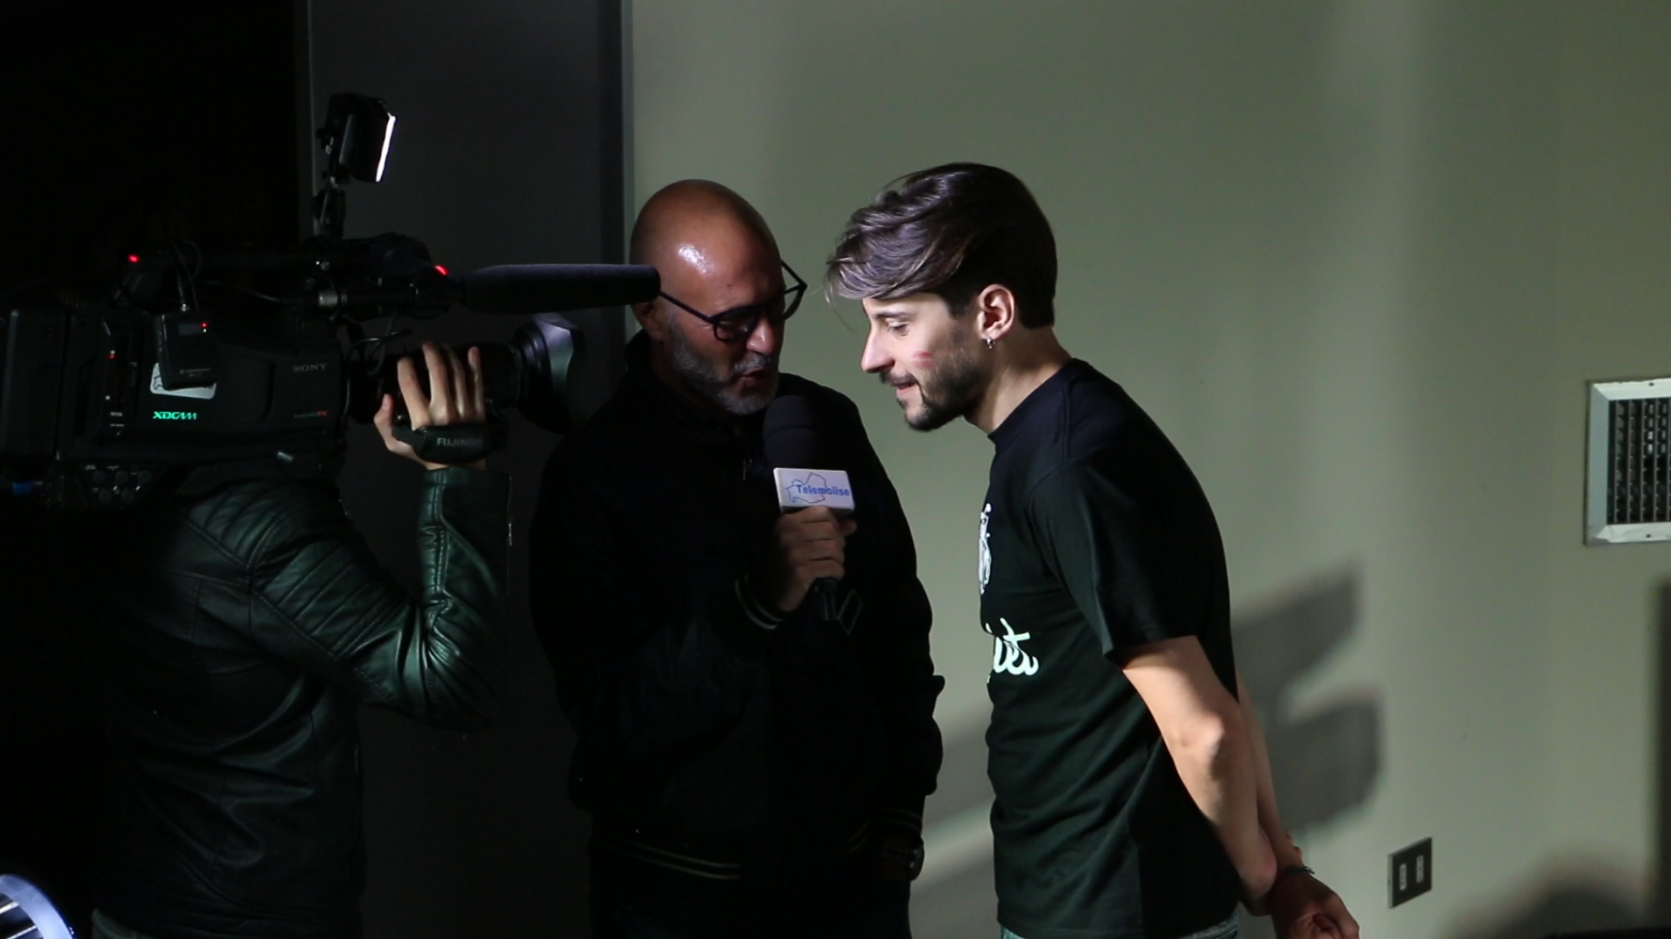 Giovanni Block Intervistato da TeleMolise